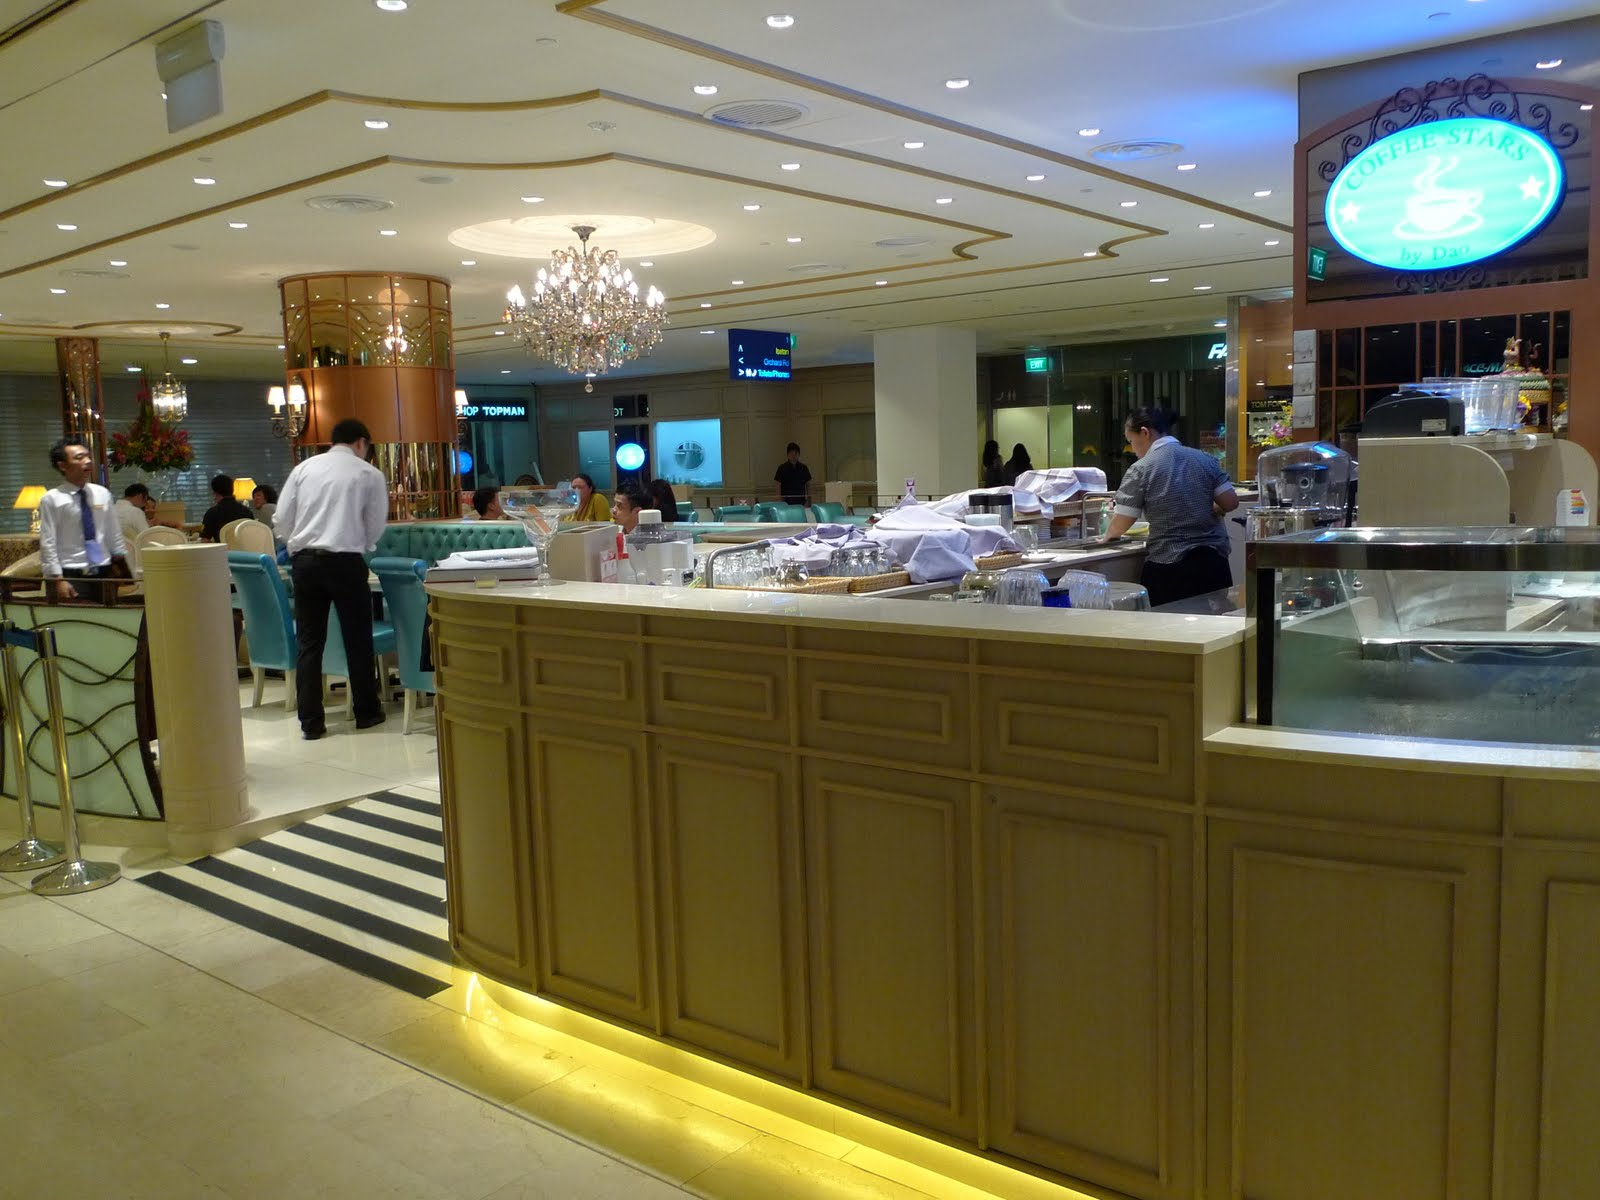 Royal Thai Cafe Keauhou Menu